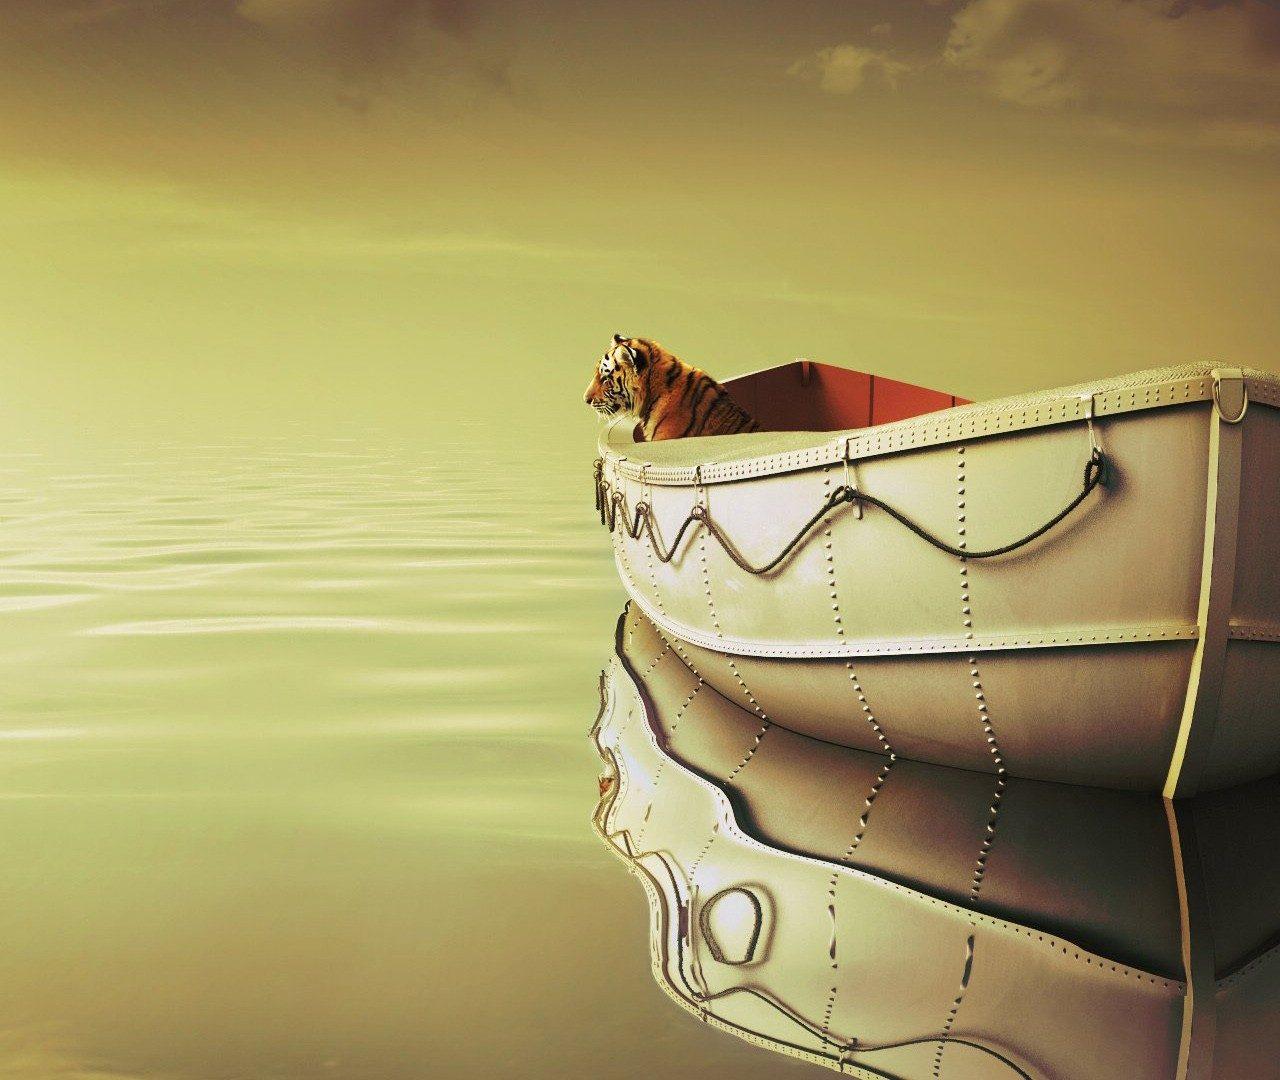 Life Of Pi Boat Tiger Wallpaper   HD Wallpapers